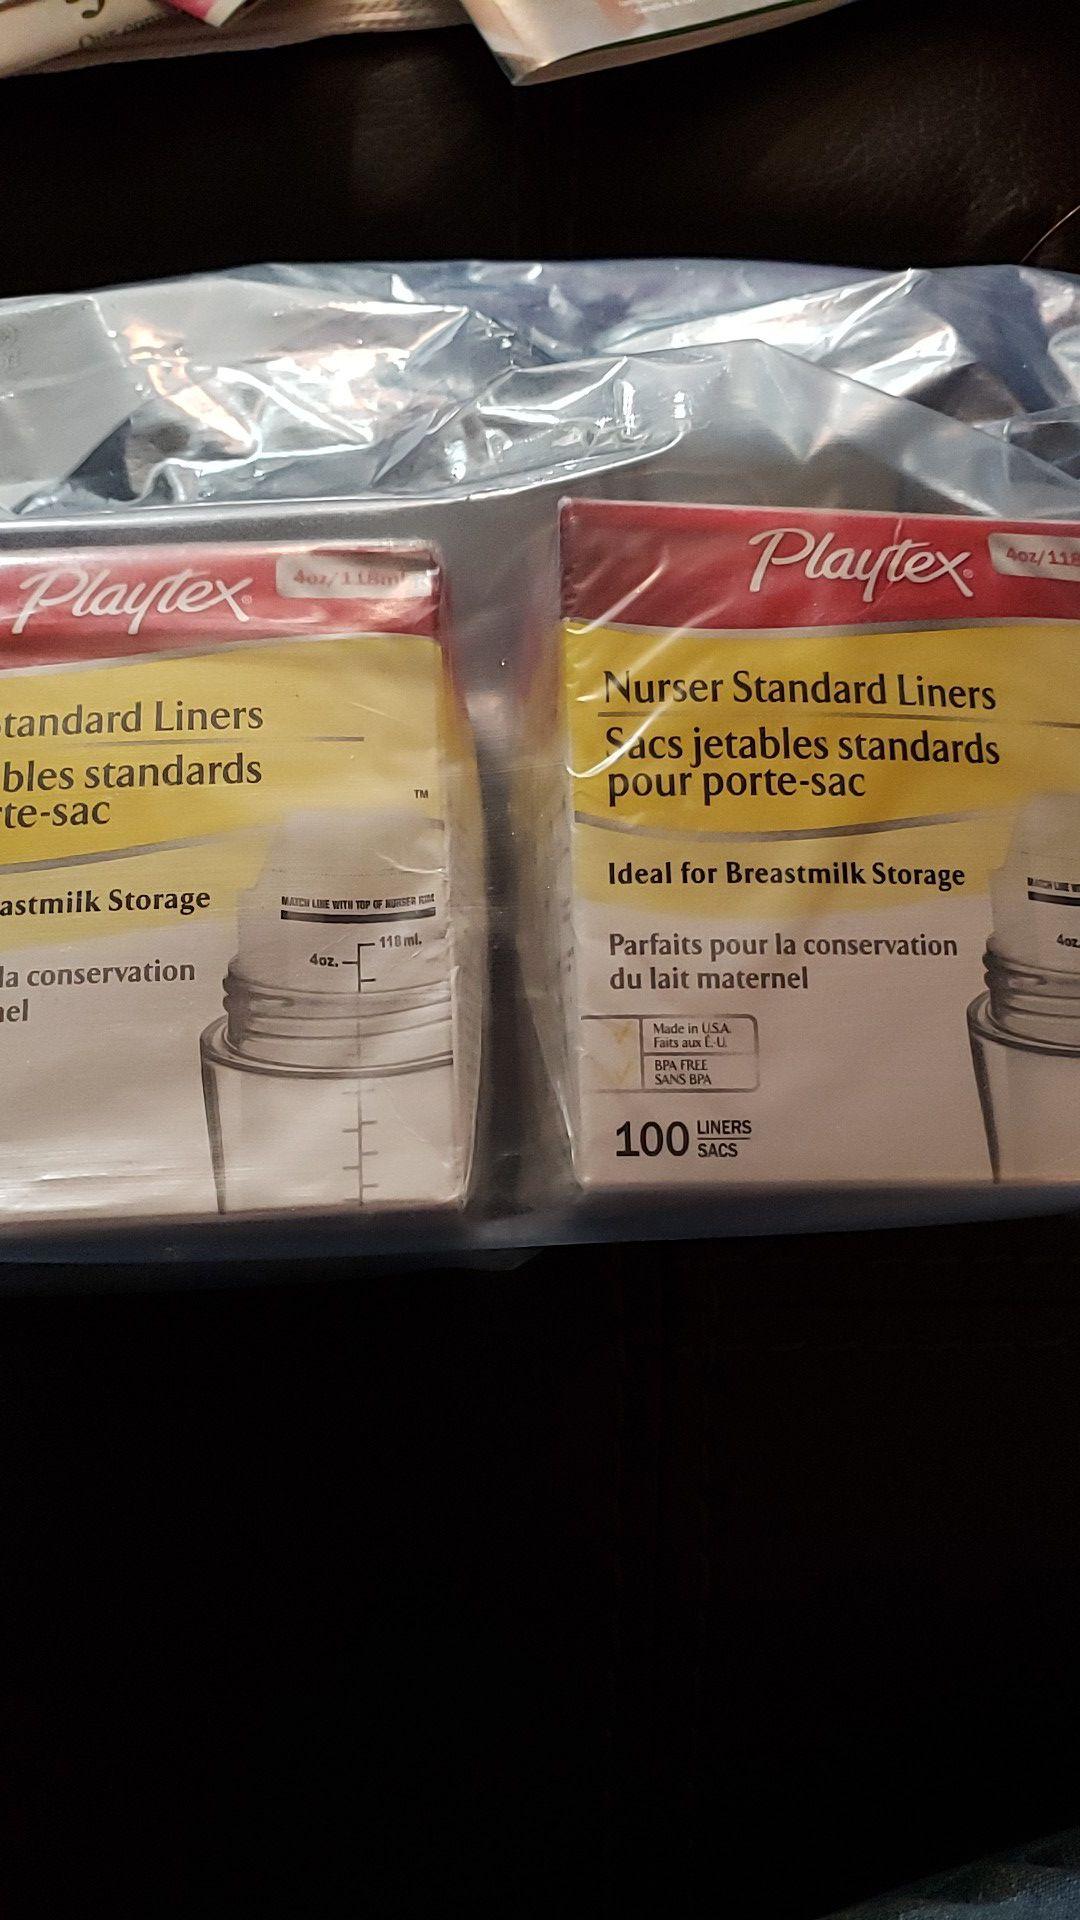 Playtex Nurser bottles